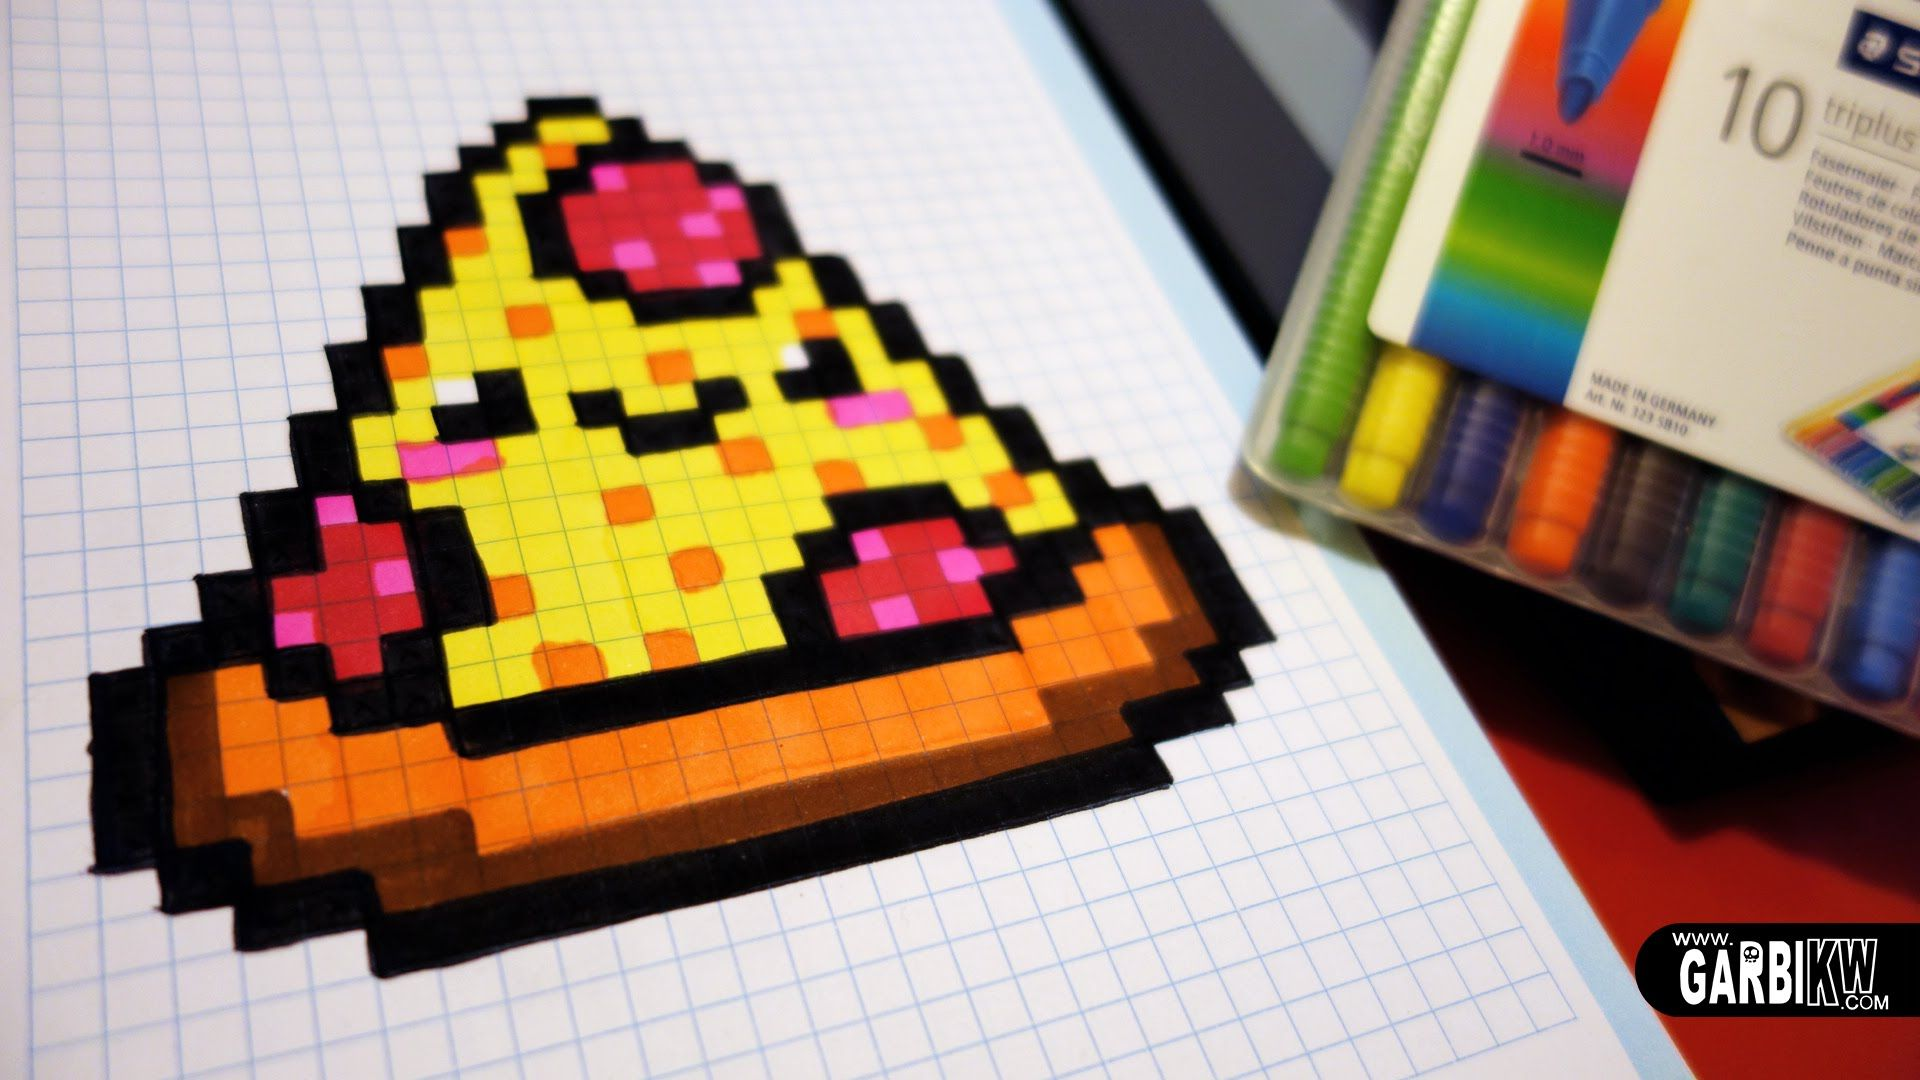 Handmade Pixel Art How To Draw A Kawaii Pizza By Garbi Kw